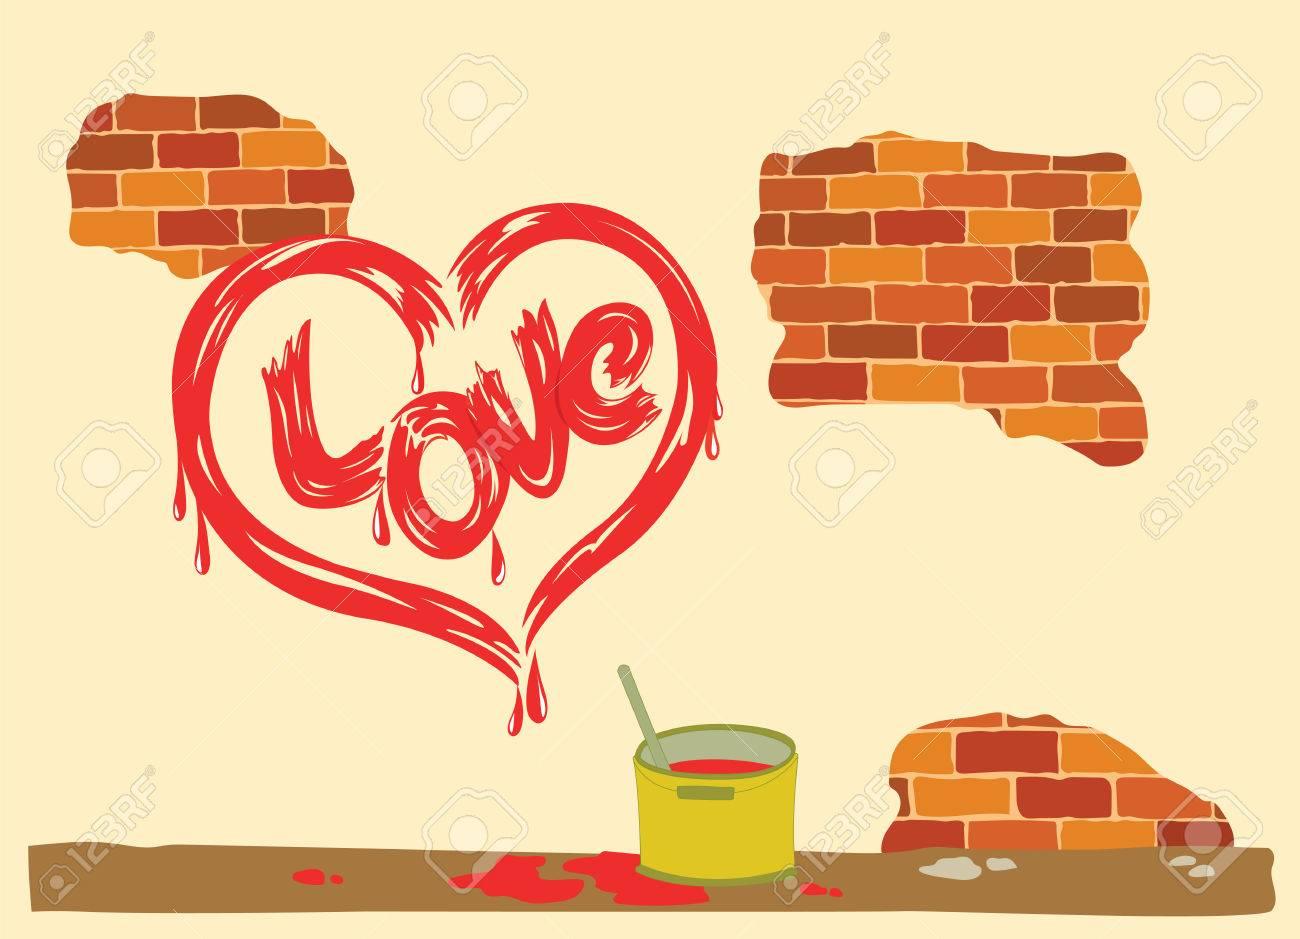 Heart Drawing Signed Love Peeling Brick Wall. Royalty Free Cliparts ...